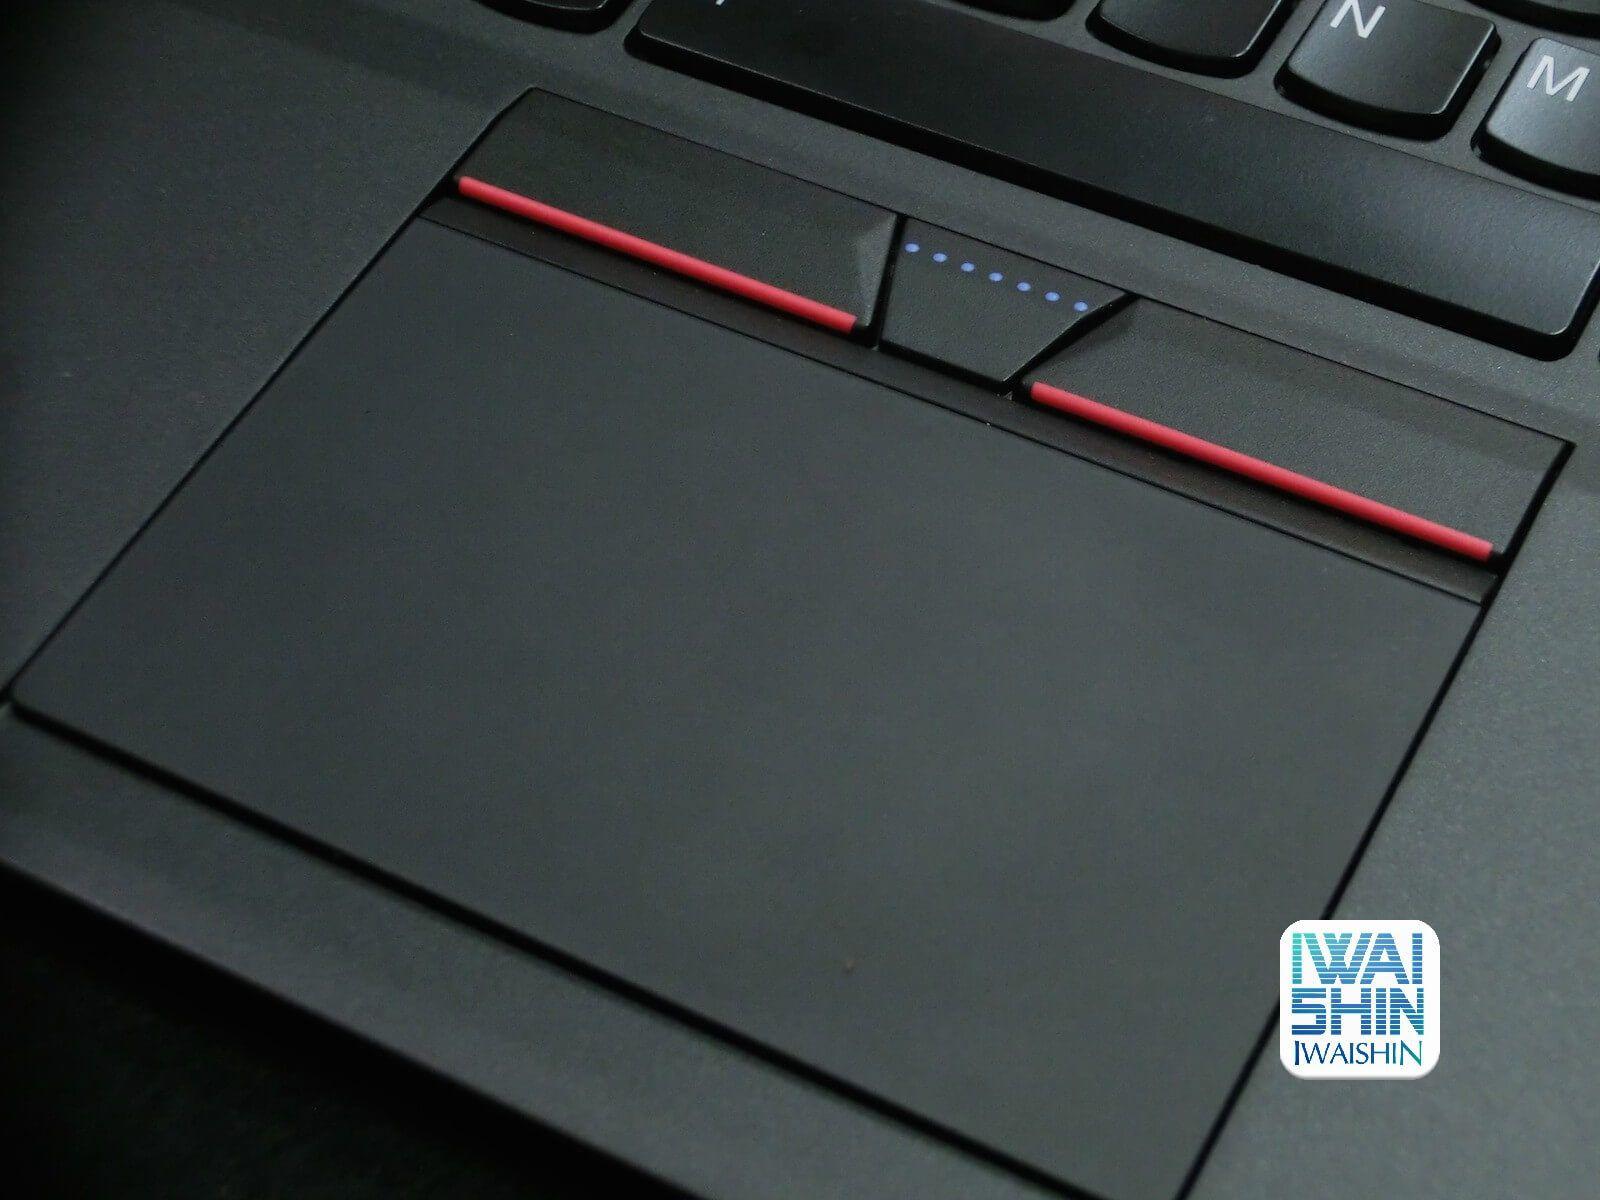 Lenovo ThinkPad x1 Carbon933